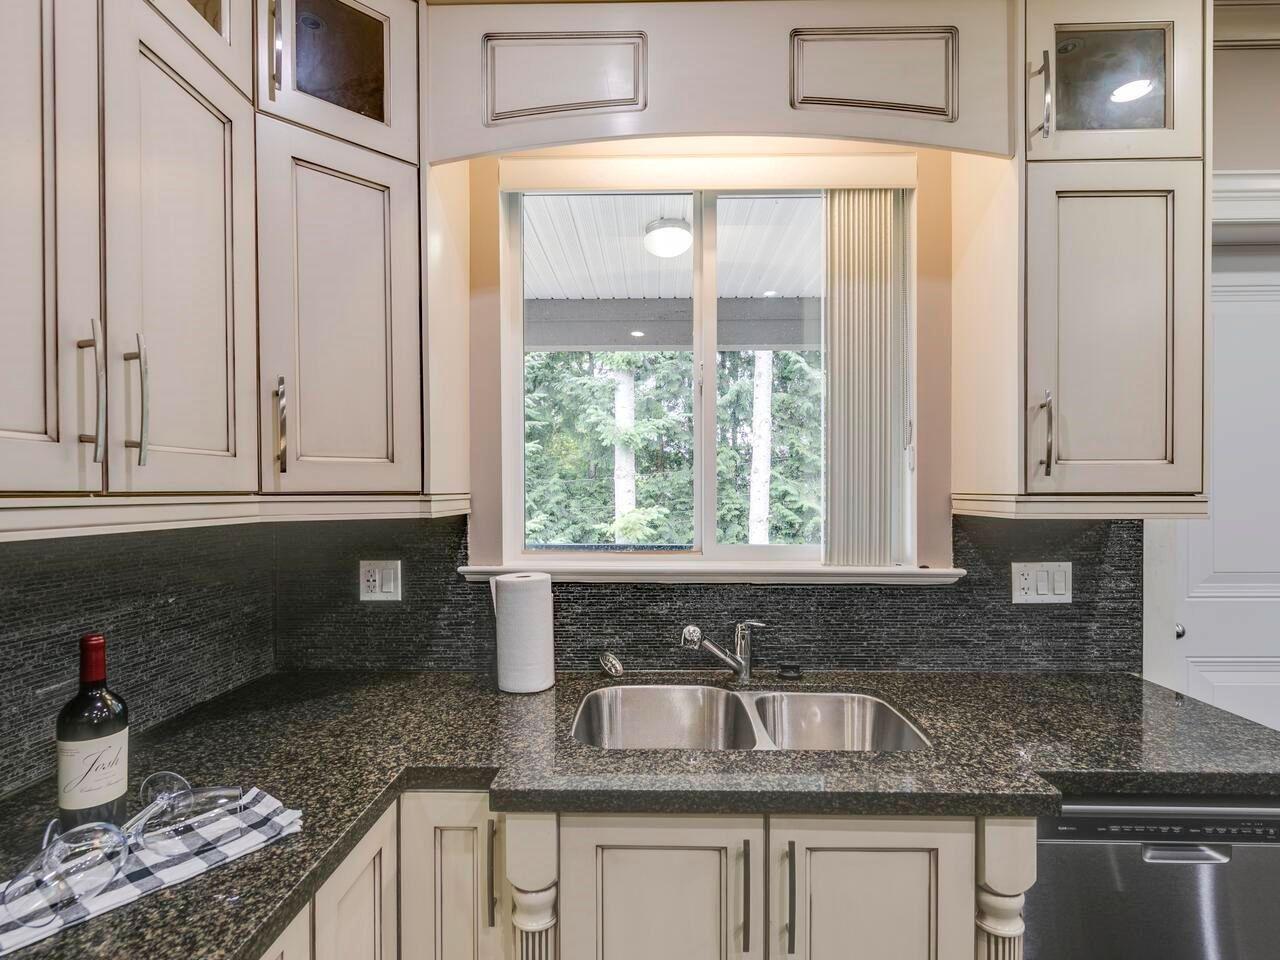 "Photo 12: Photos: 22845 126B Avenue in Maple Ridge: East Central House for sale in ""EAST CENTRAL MAPLE RIDGE"" : MLS®# R2594638"